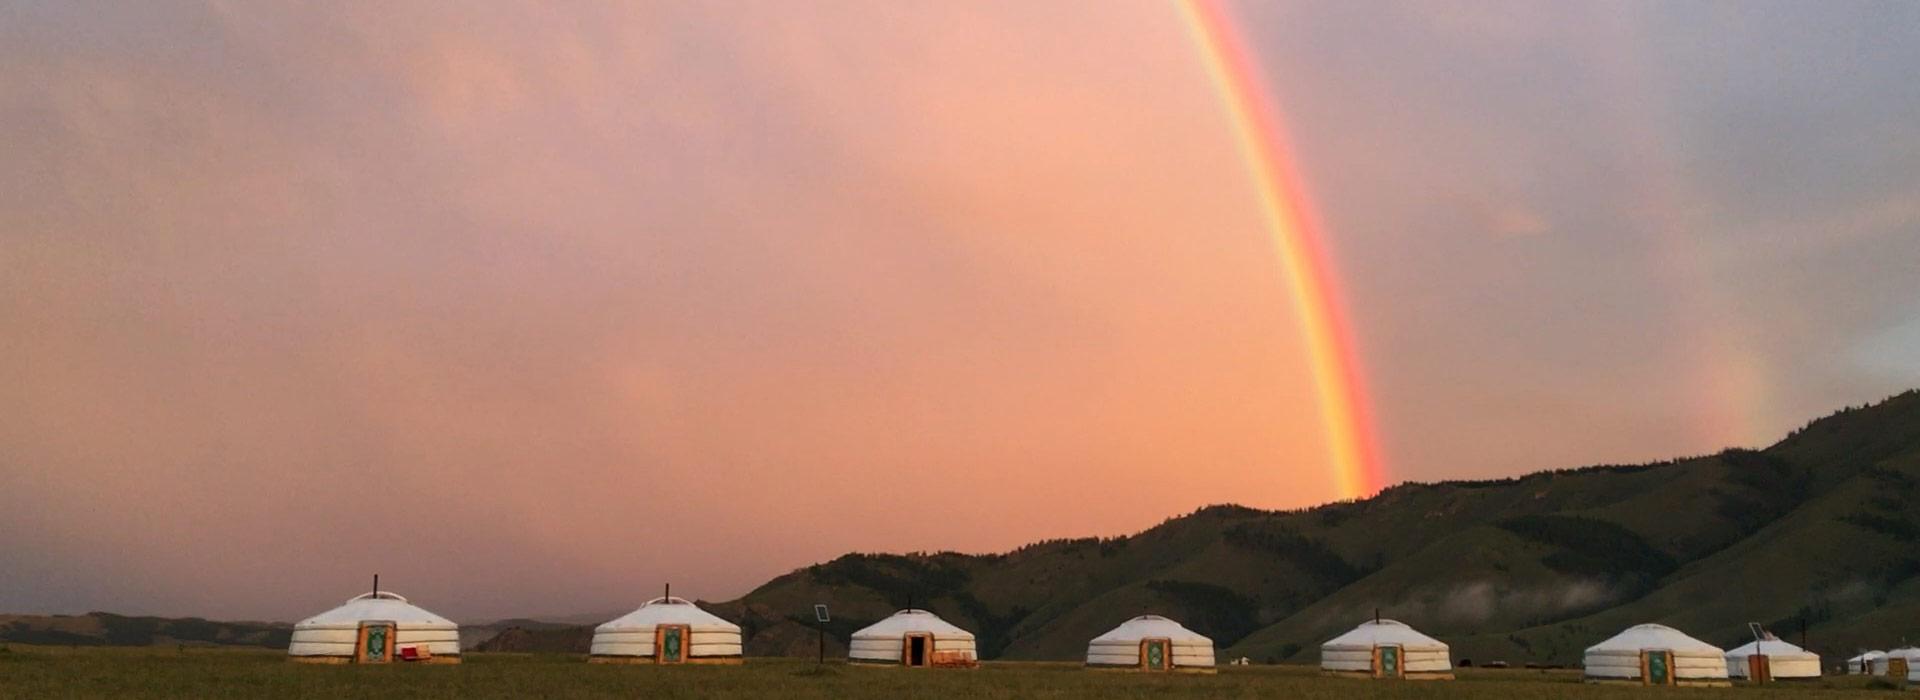 mongolia-climate